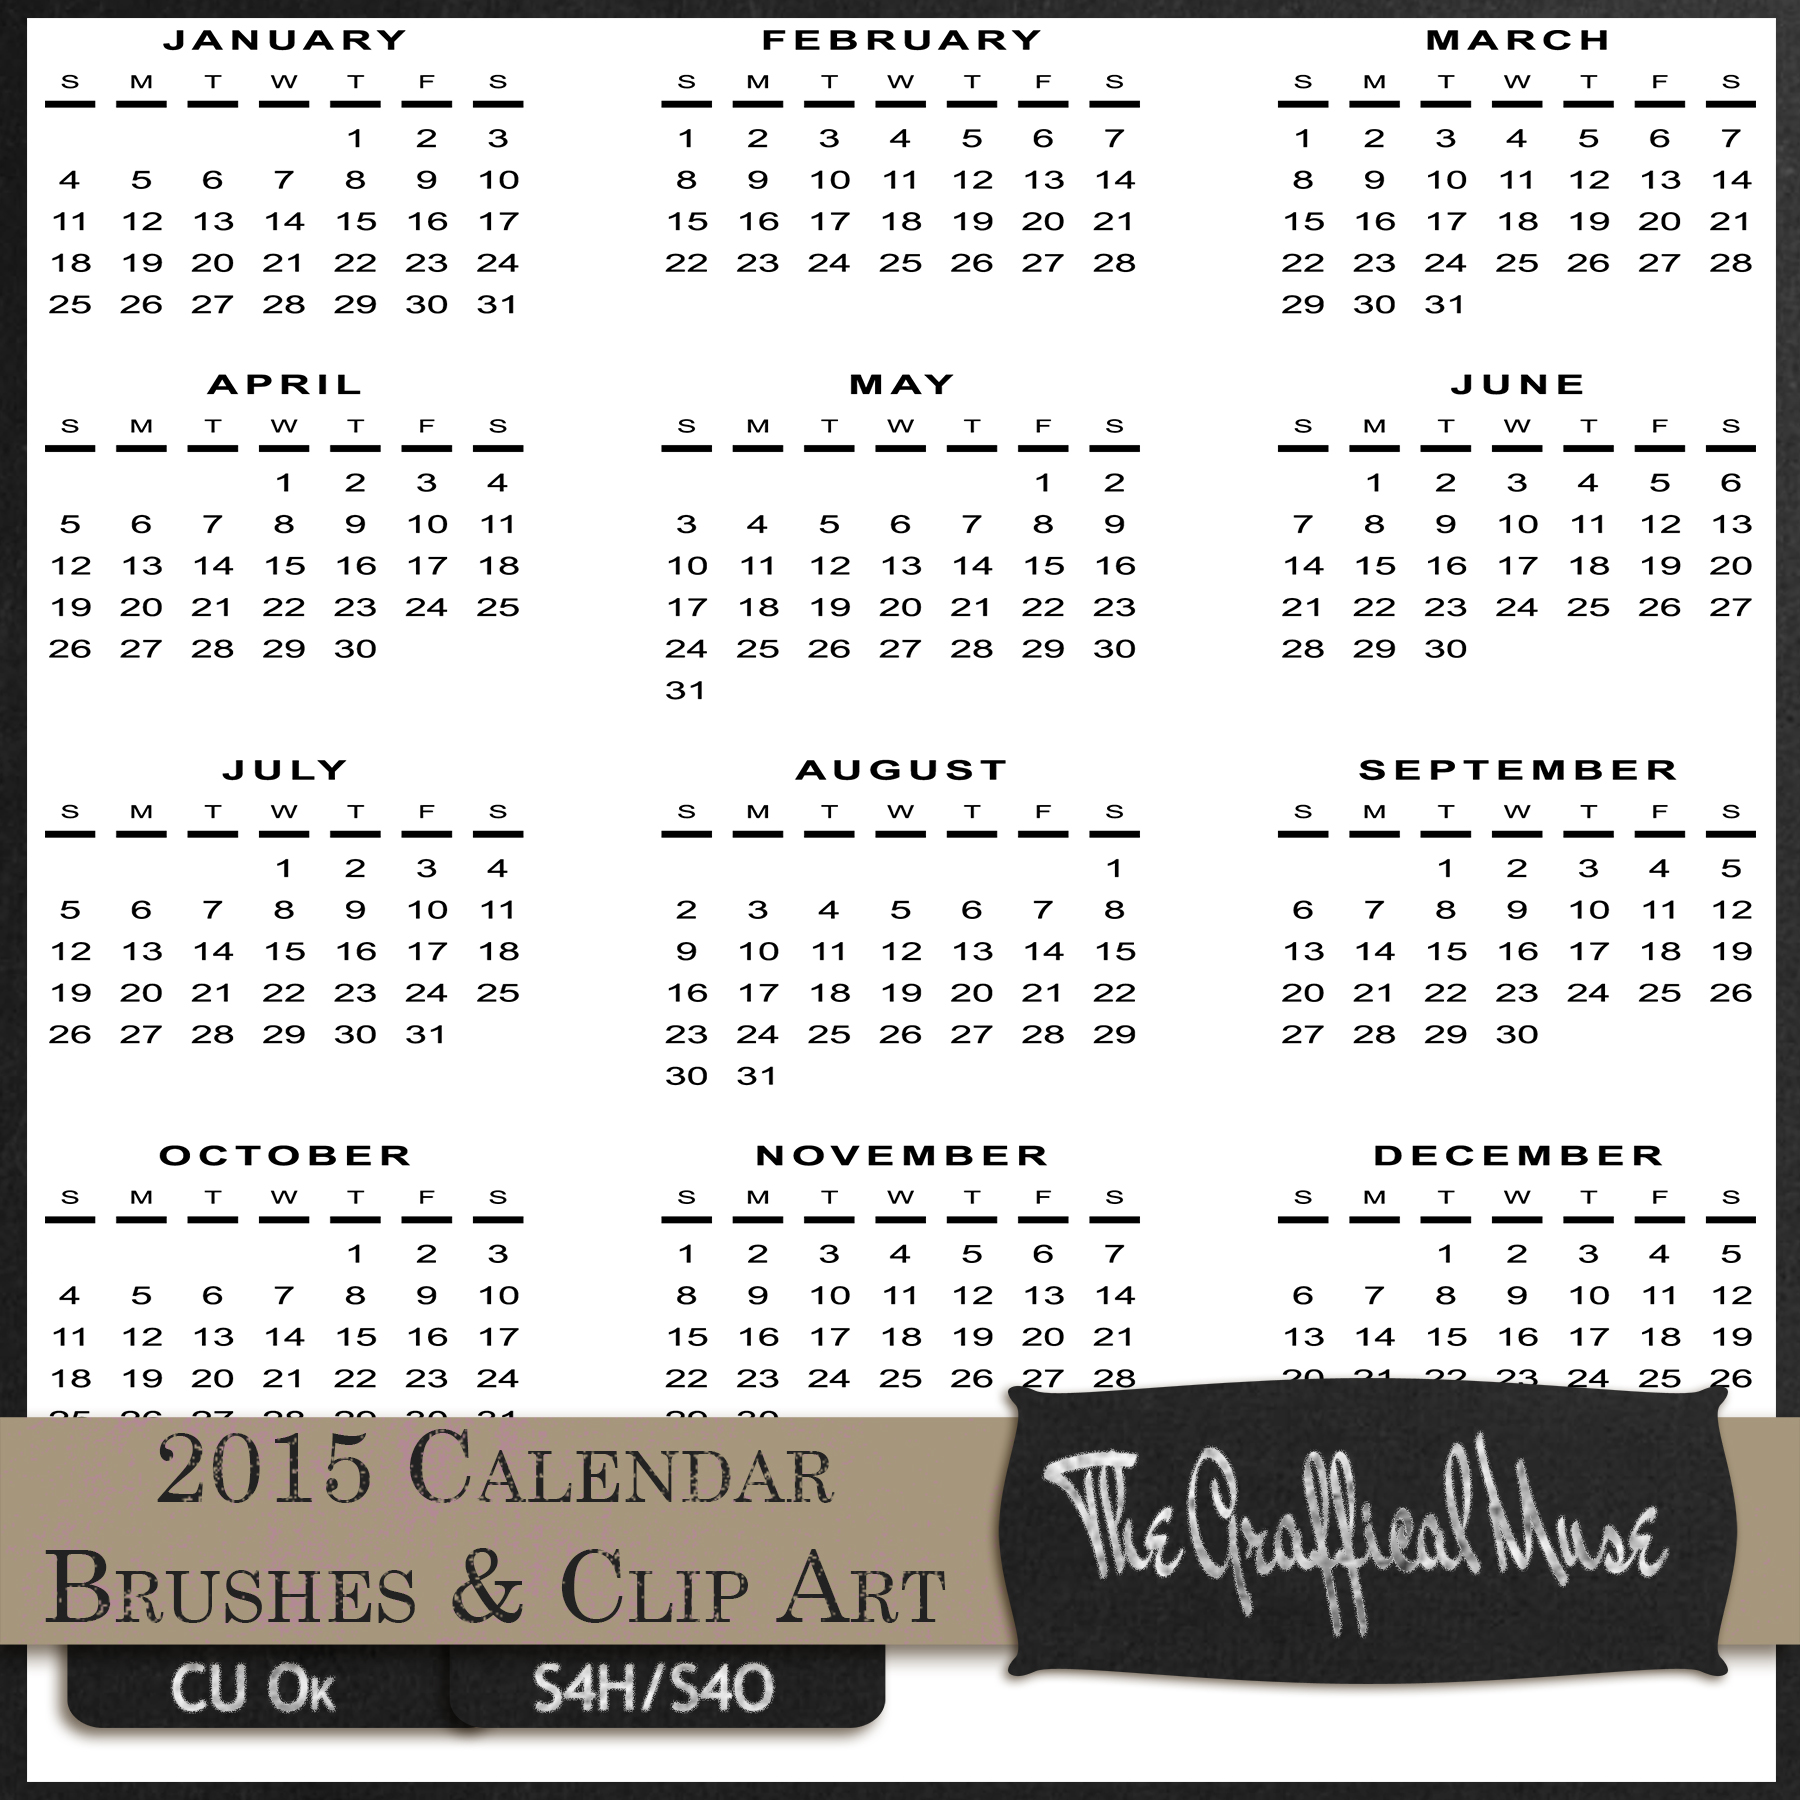 2016 calendar clipart free photoshop picture transparent stock 2016 calendar clipart free photoshop - ClipartFest picture transparent stock